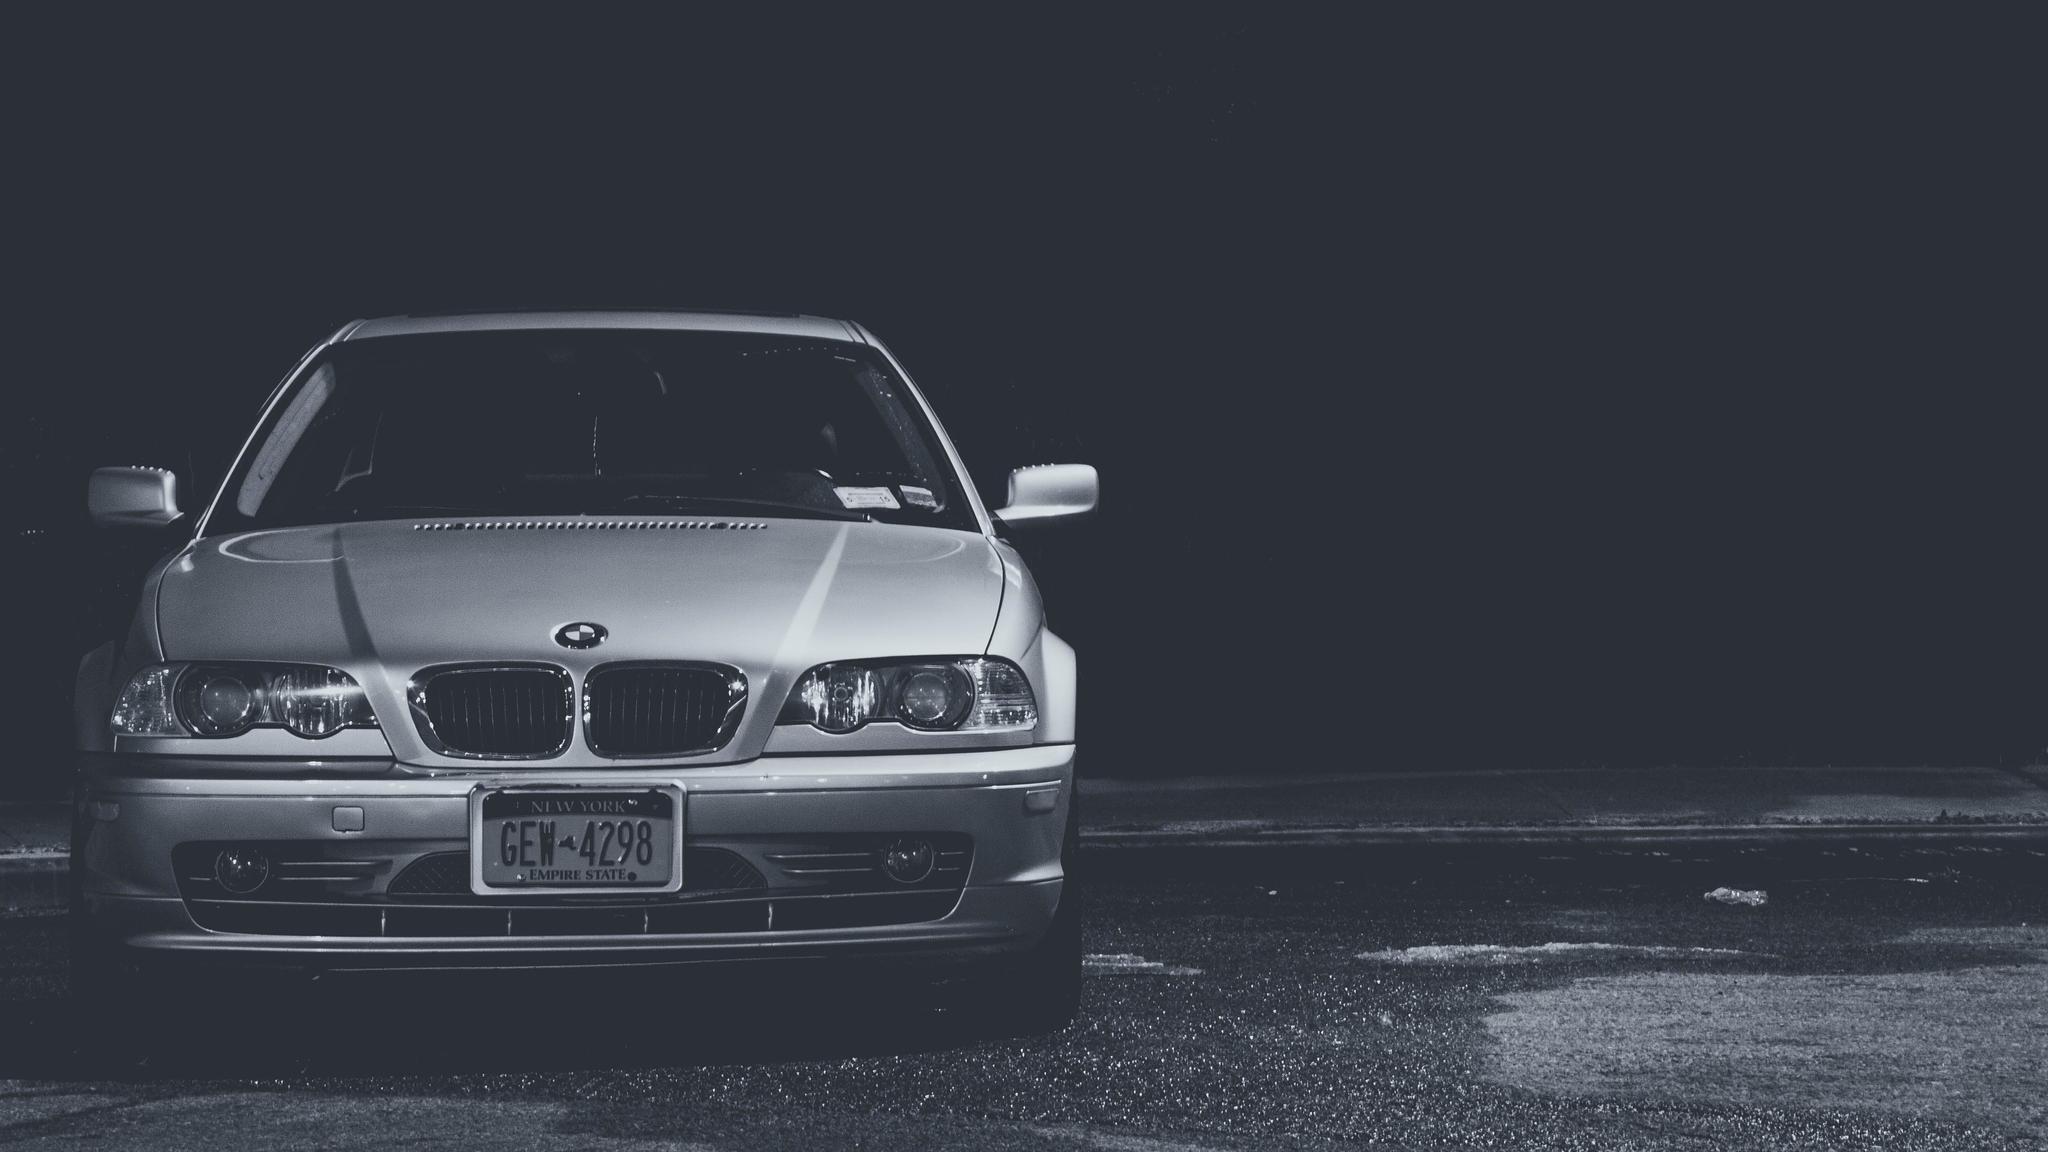 черно-бело фото BMW  № 2422785 загрузить